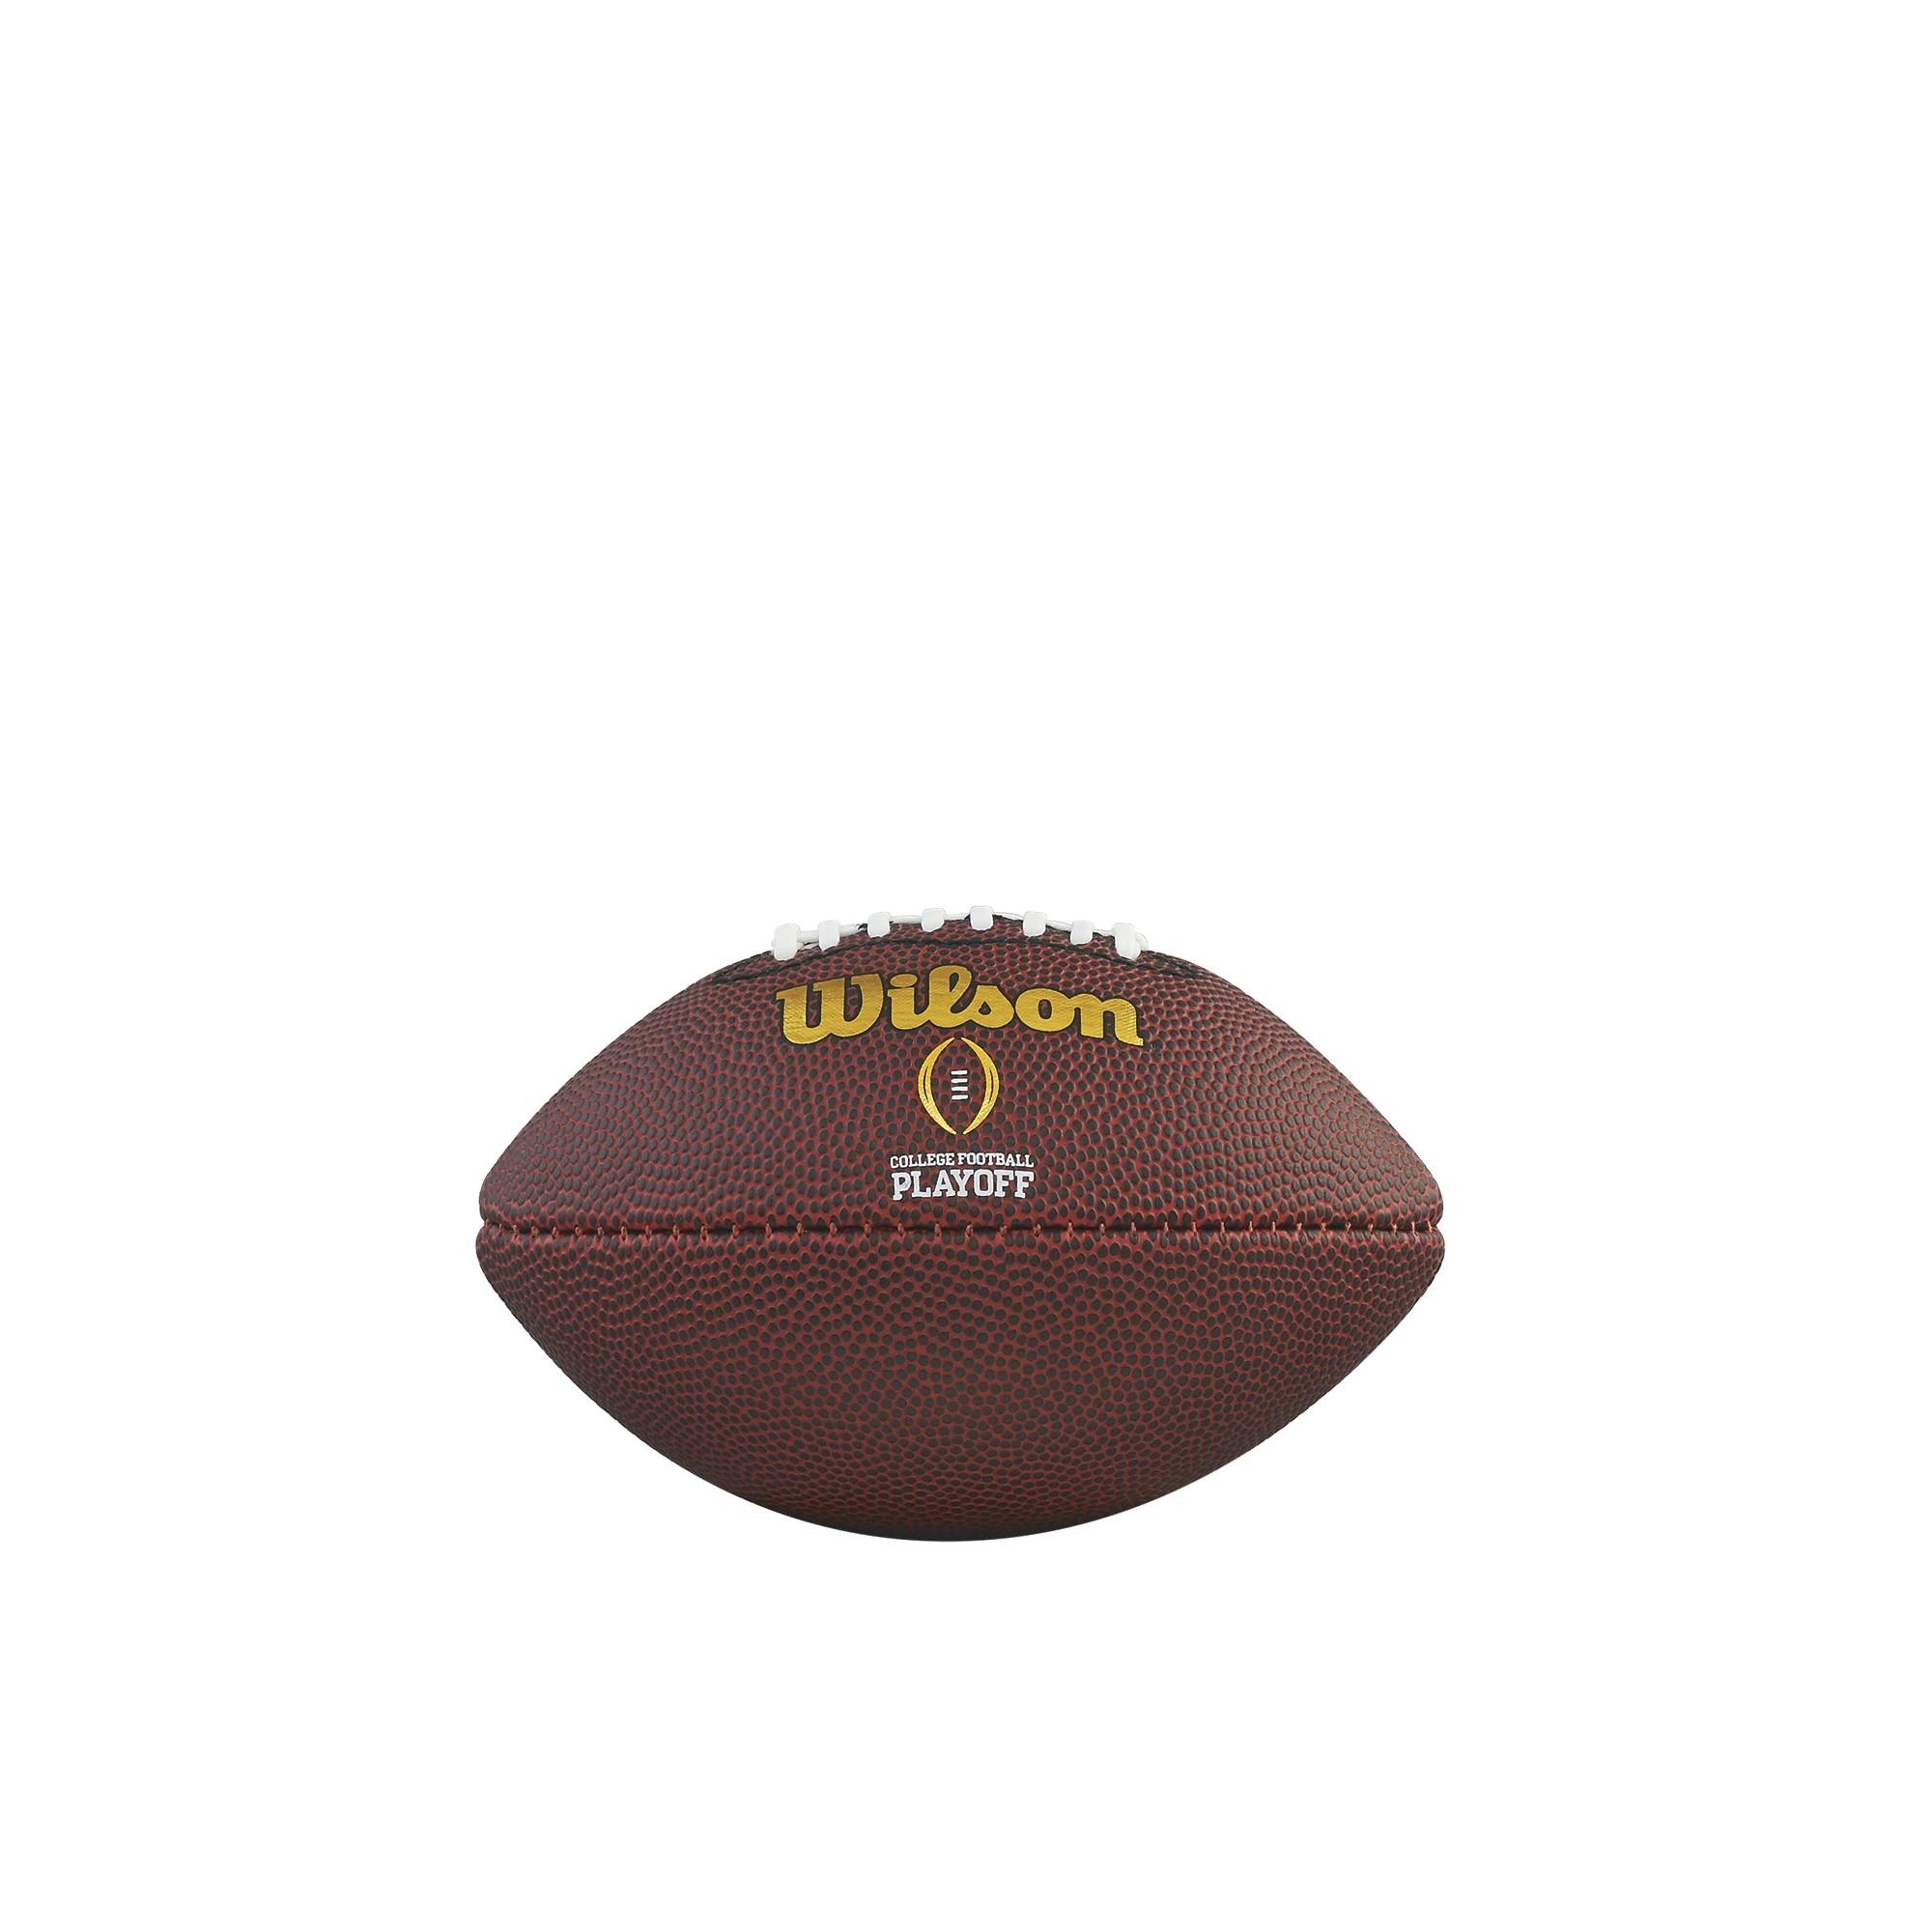 WILSON amerikanu futbola NFL MICRO FOOTBALL bumba